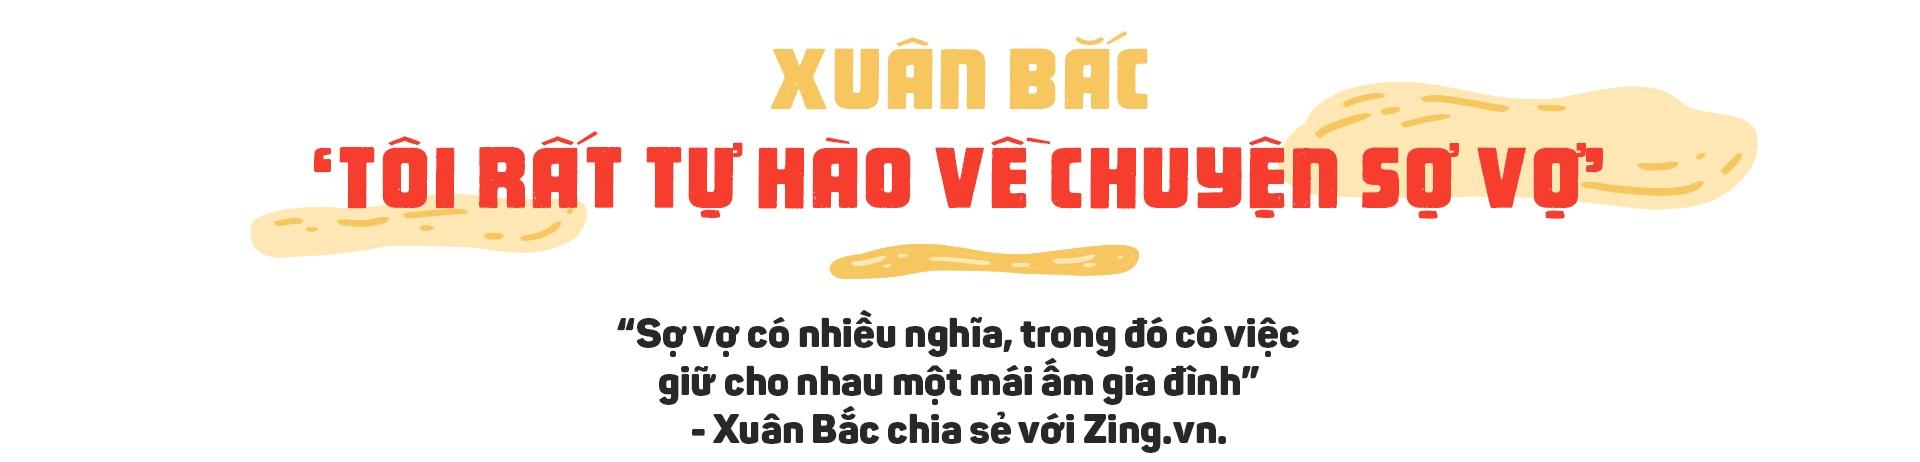 Dang sau su so vo cua 'Nam Tao' Xuan Bac hinh anh 4